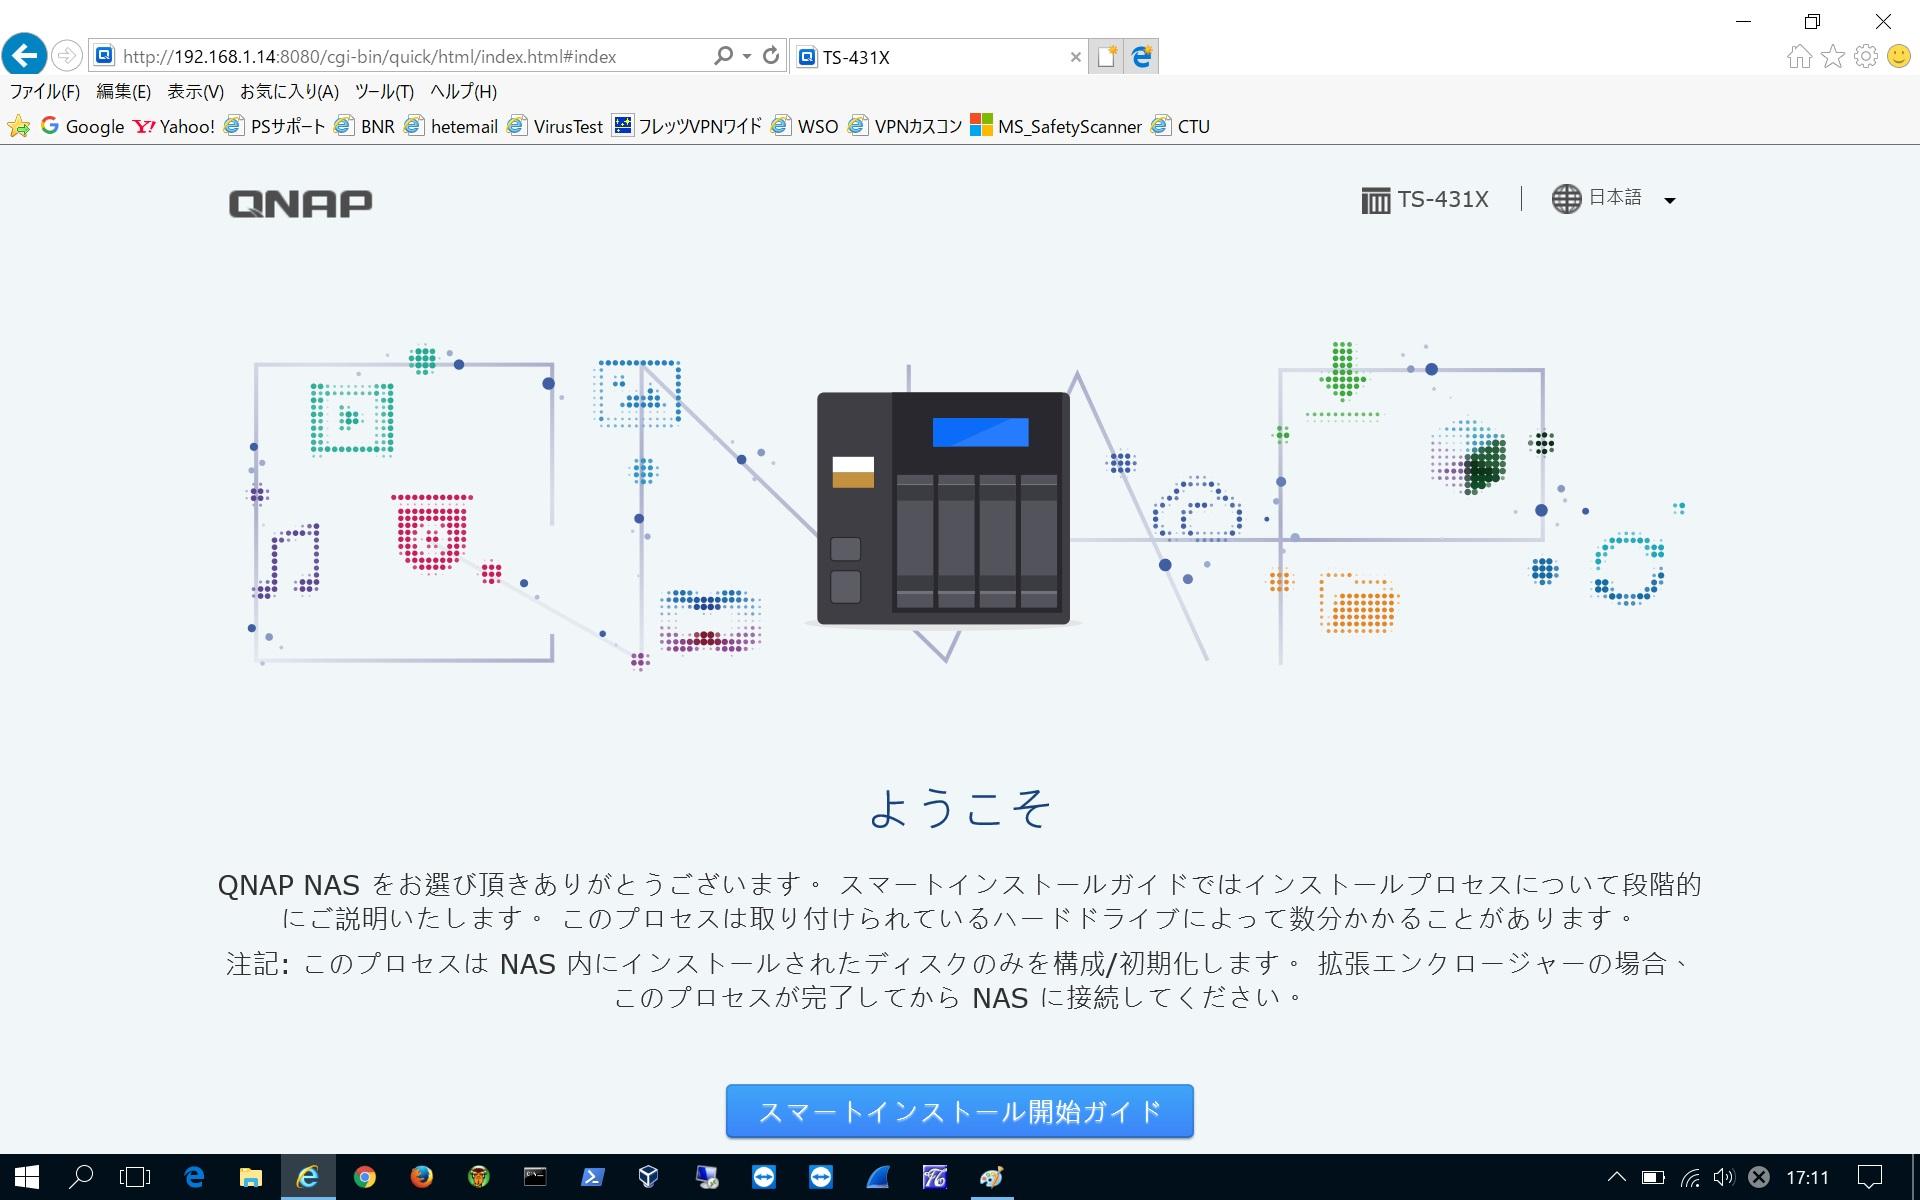 001 QNAP-NAS_install